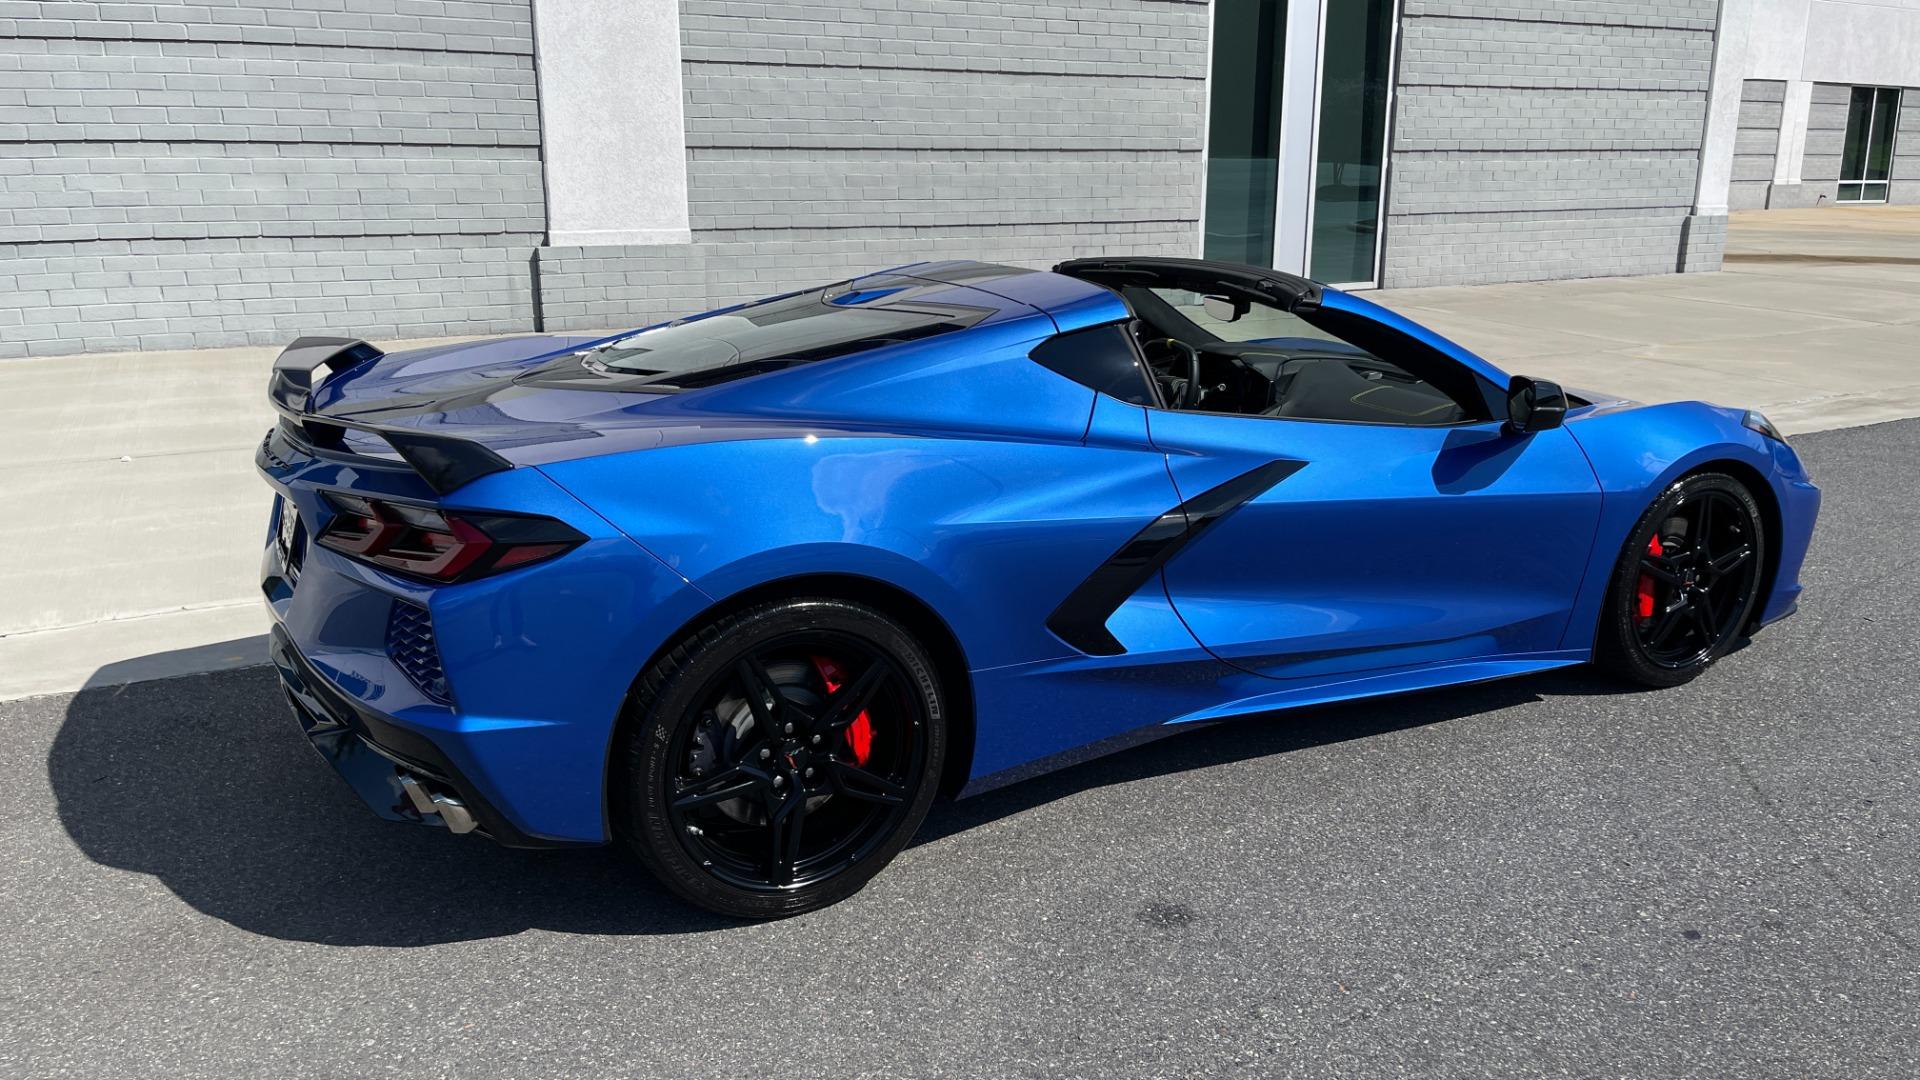 Used 2021 Chevrolet CORVETTE STINGRAY 3LT COUPE / 8-SPD / PERF PKG / NAV / BOSE / REARVIEW for sale $110,995 at Formula Imports in Charlotte NC 28227 16